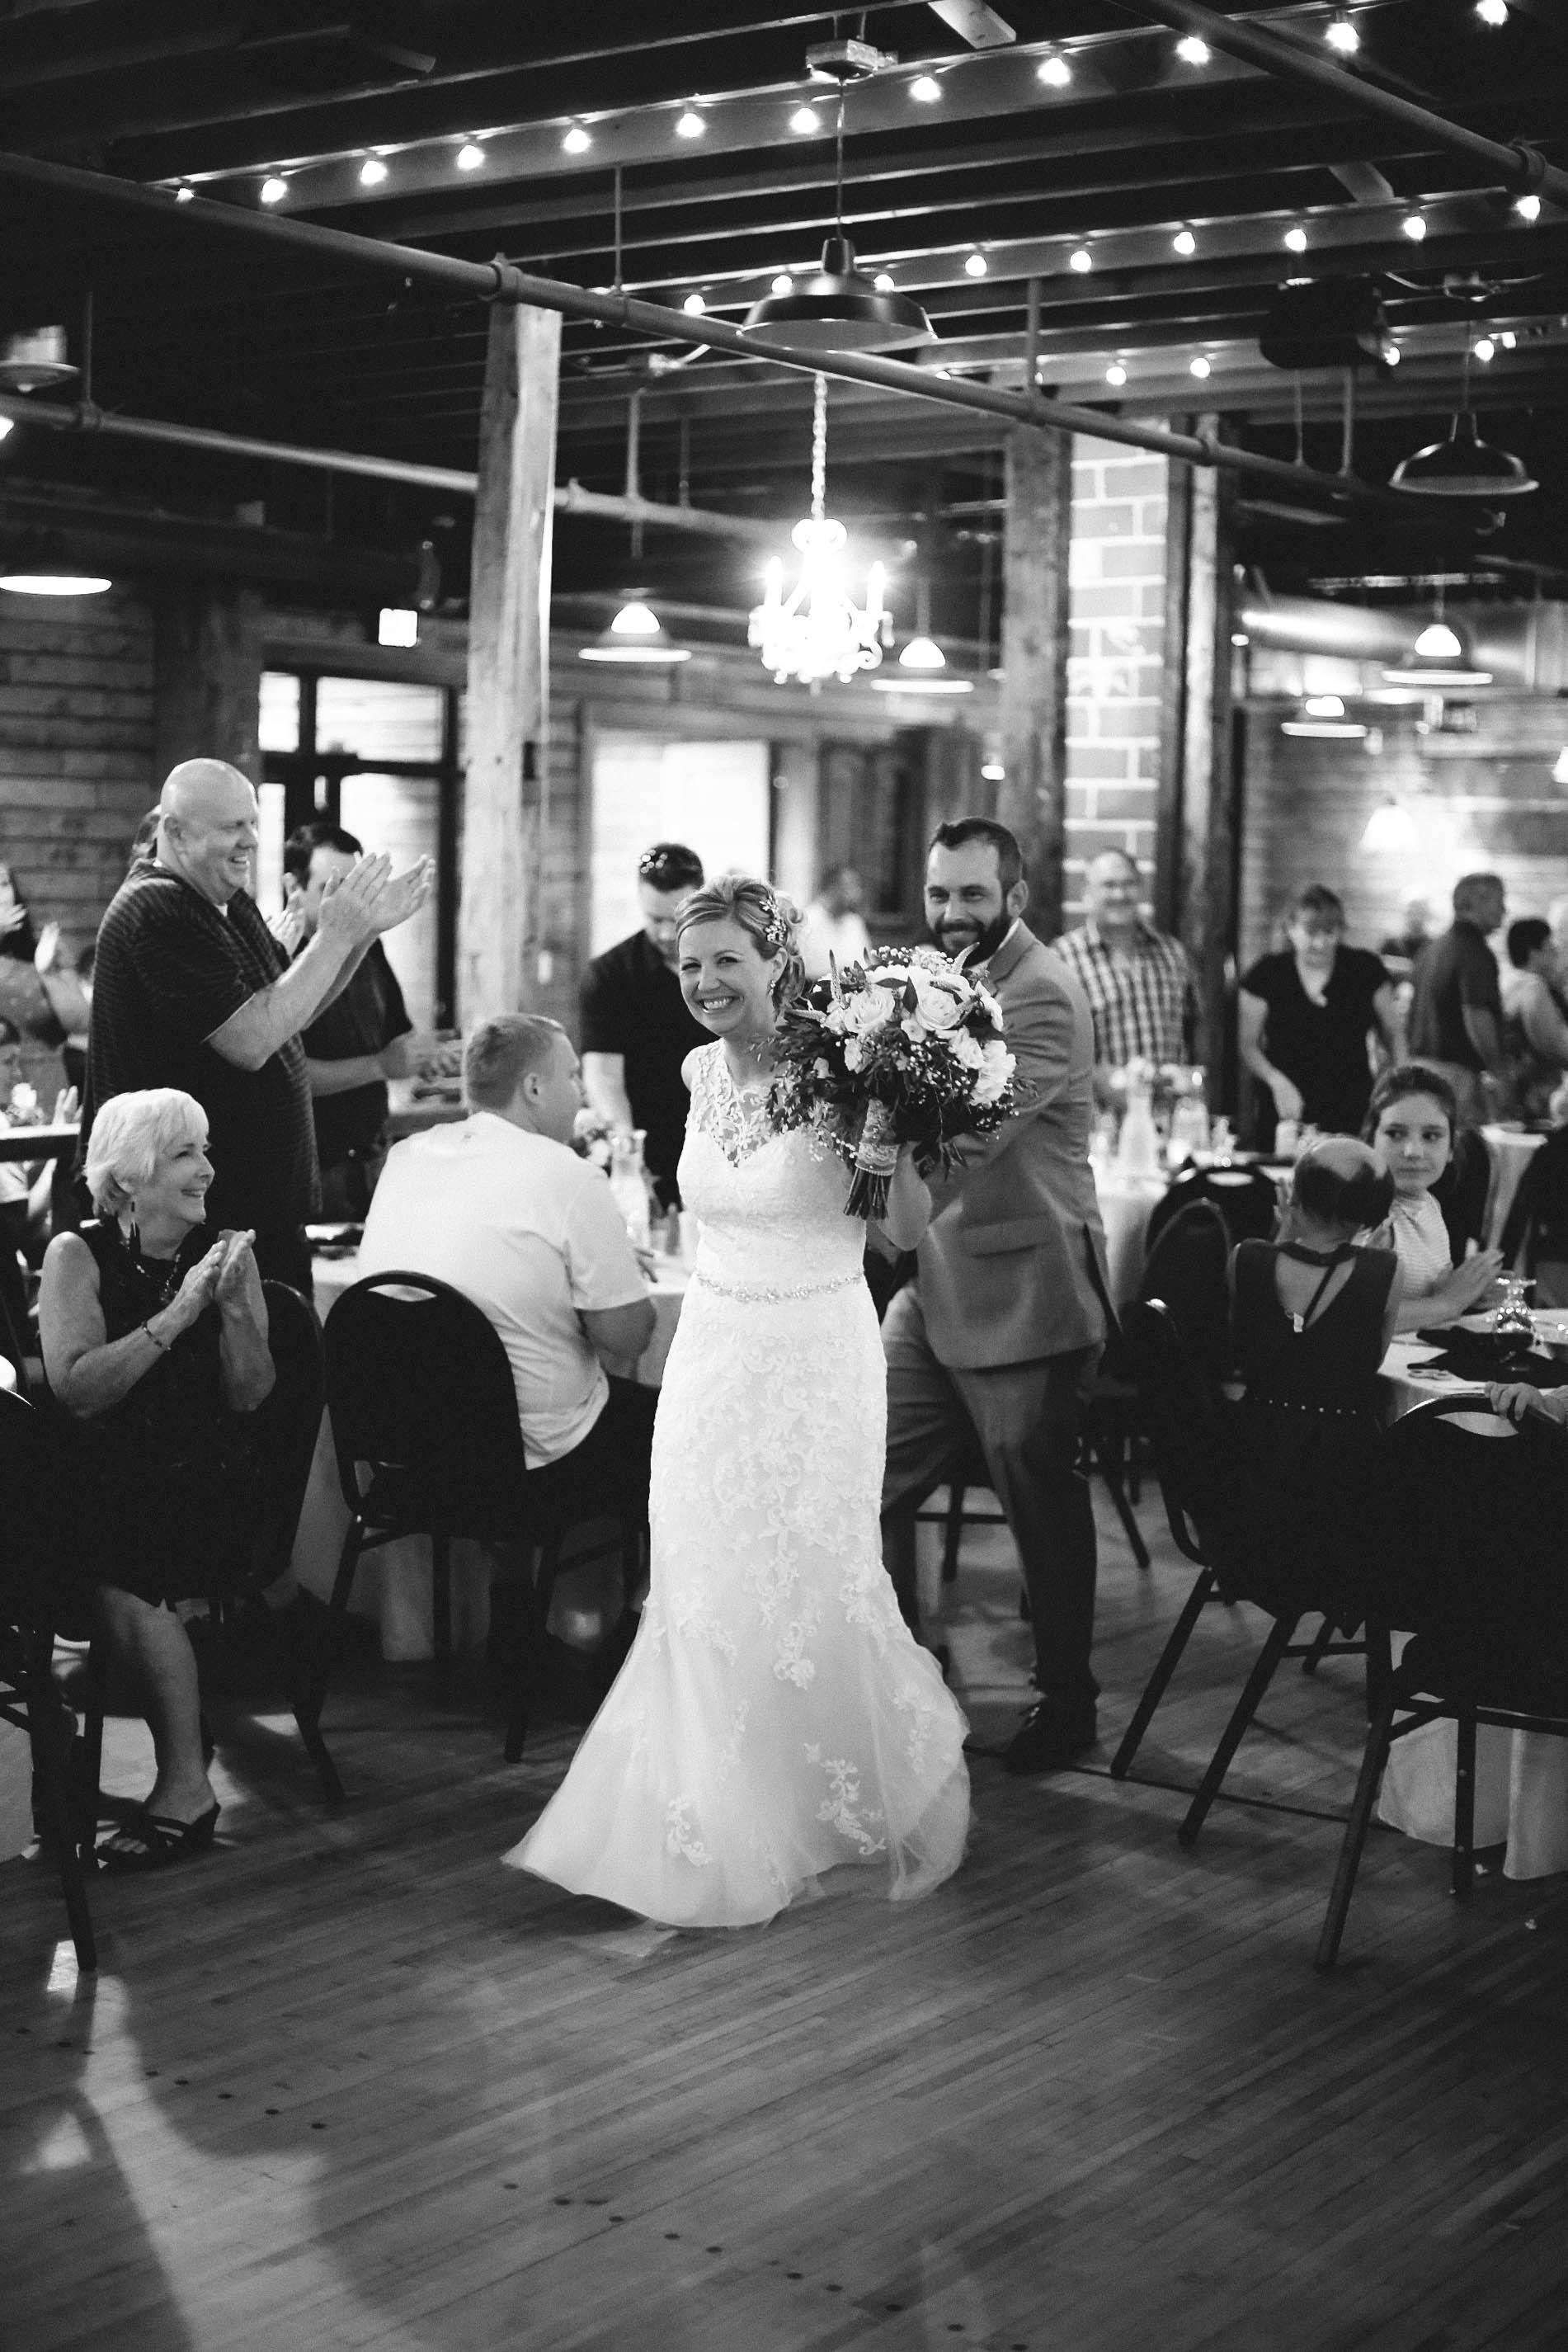 Chad and Dana's Wedding (570 of 581).jpg